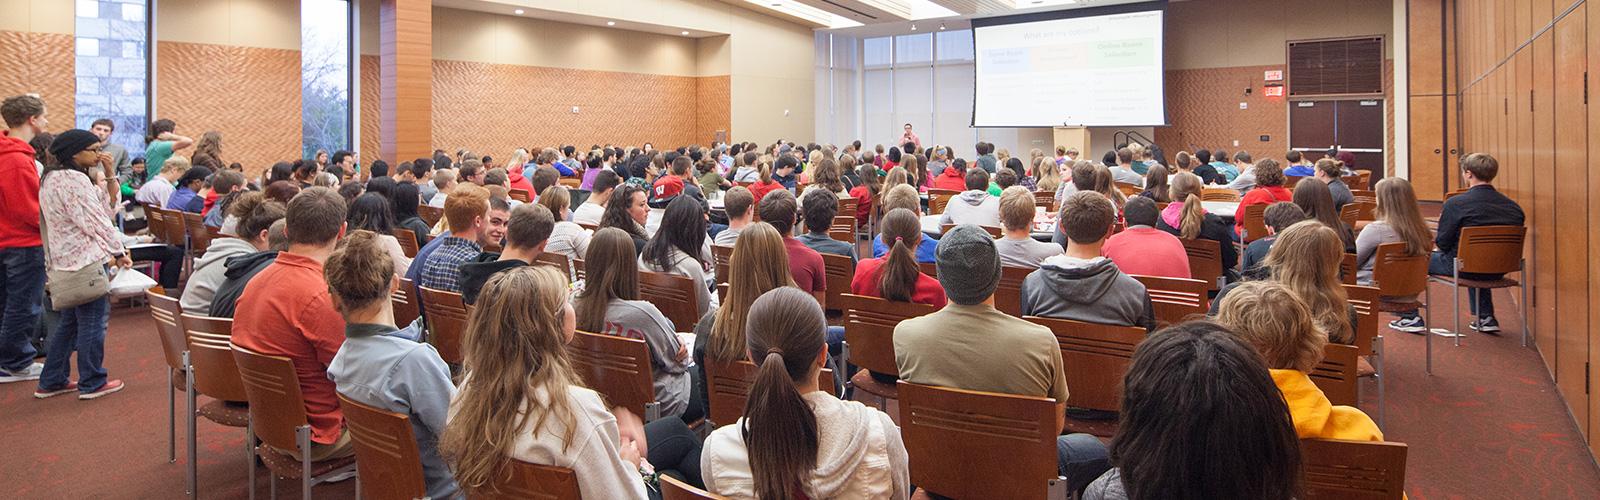 Students attending a workshop in Gordon